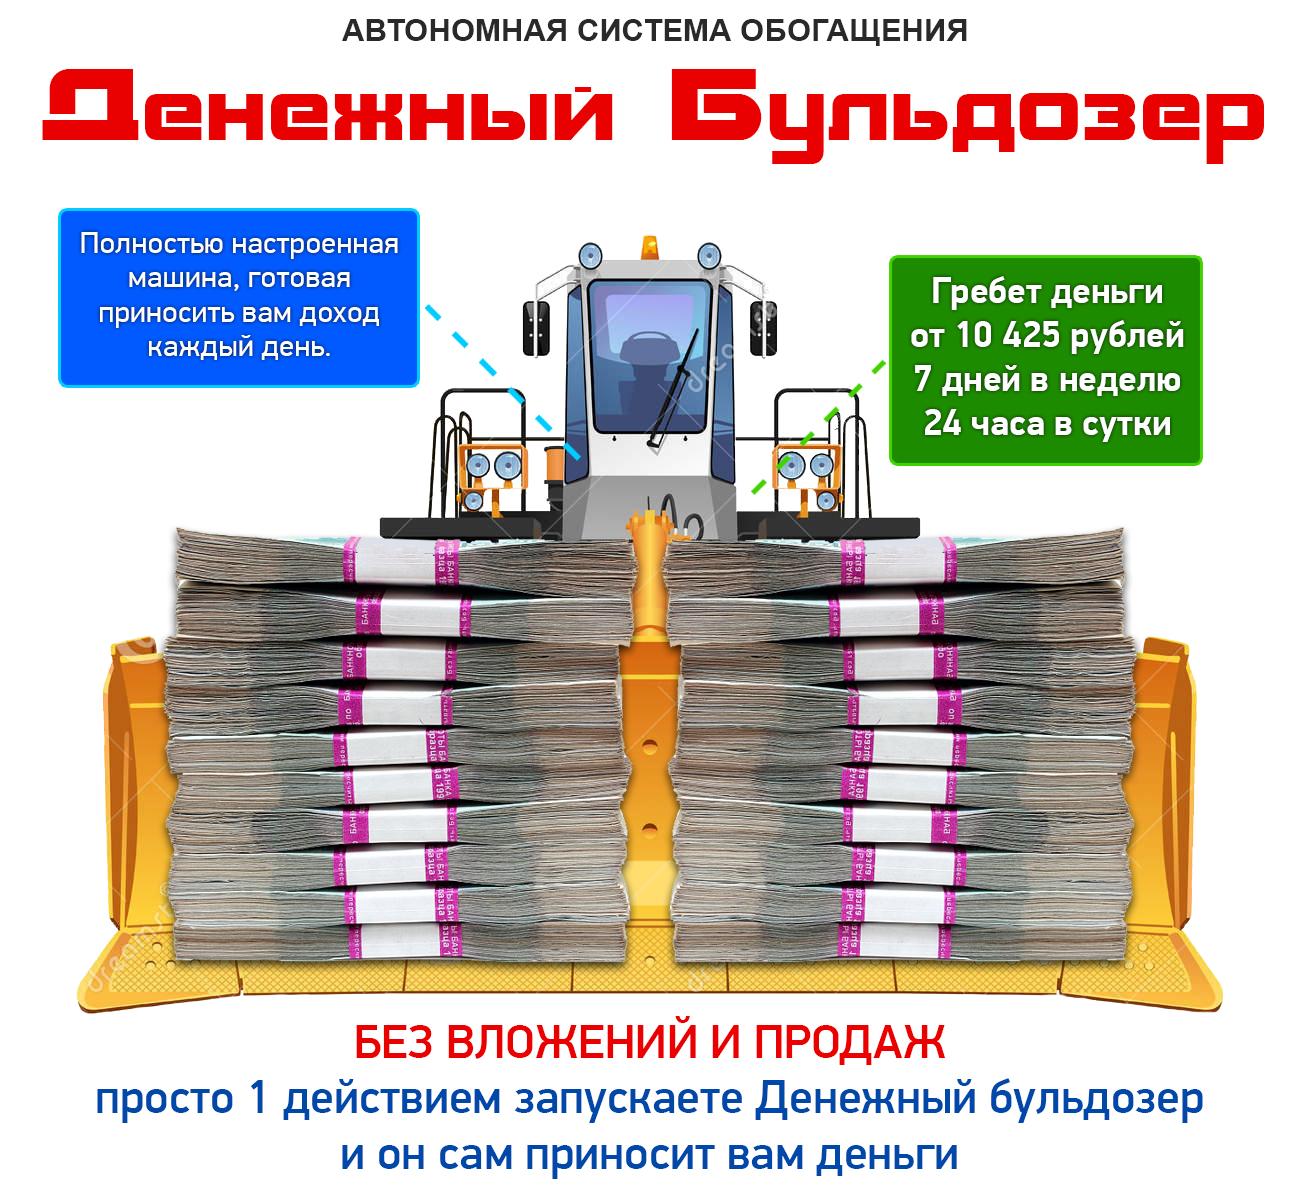 http://s3.uploads.ru/eIZ4h.jpg